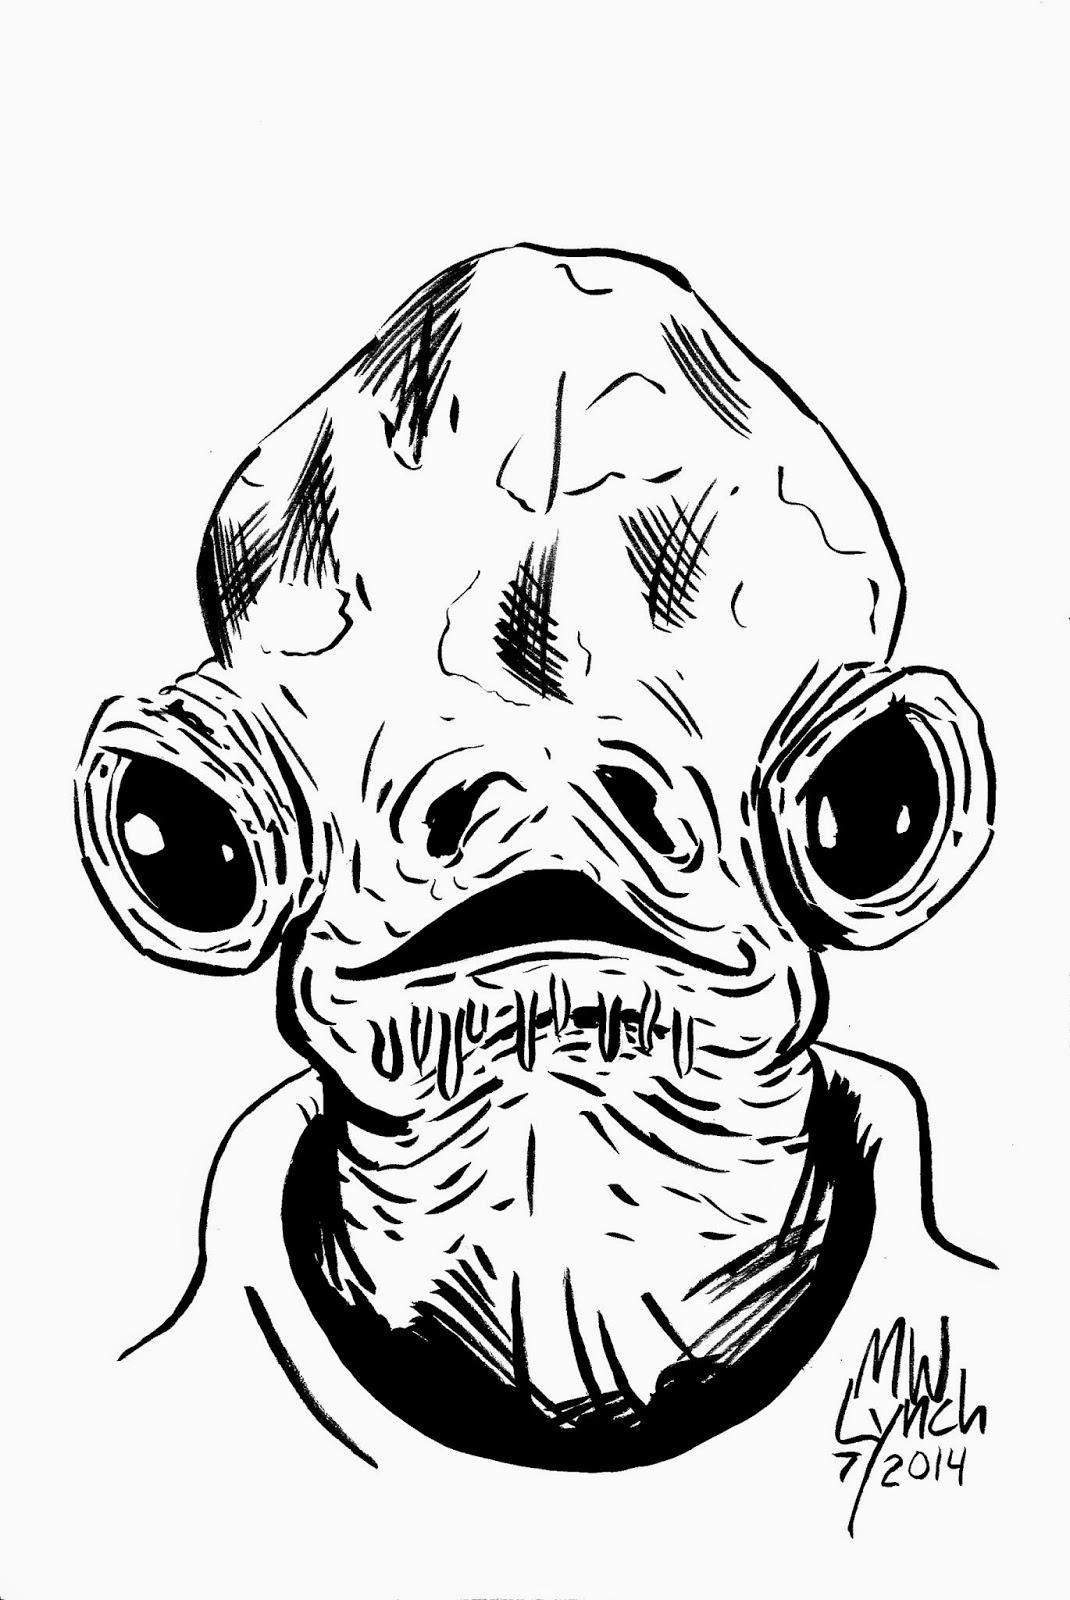 Michael Lynch Art And Illustration Star Wars Wednesday 2